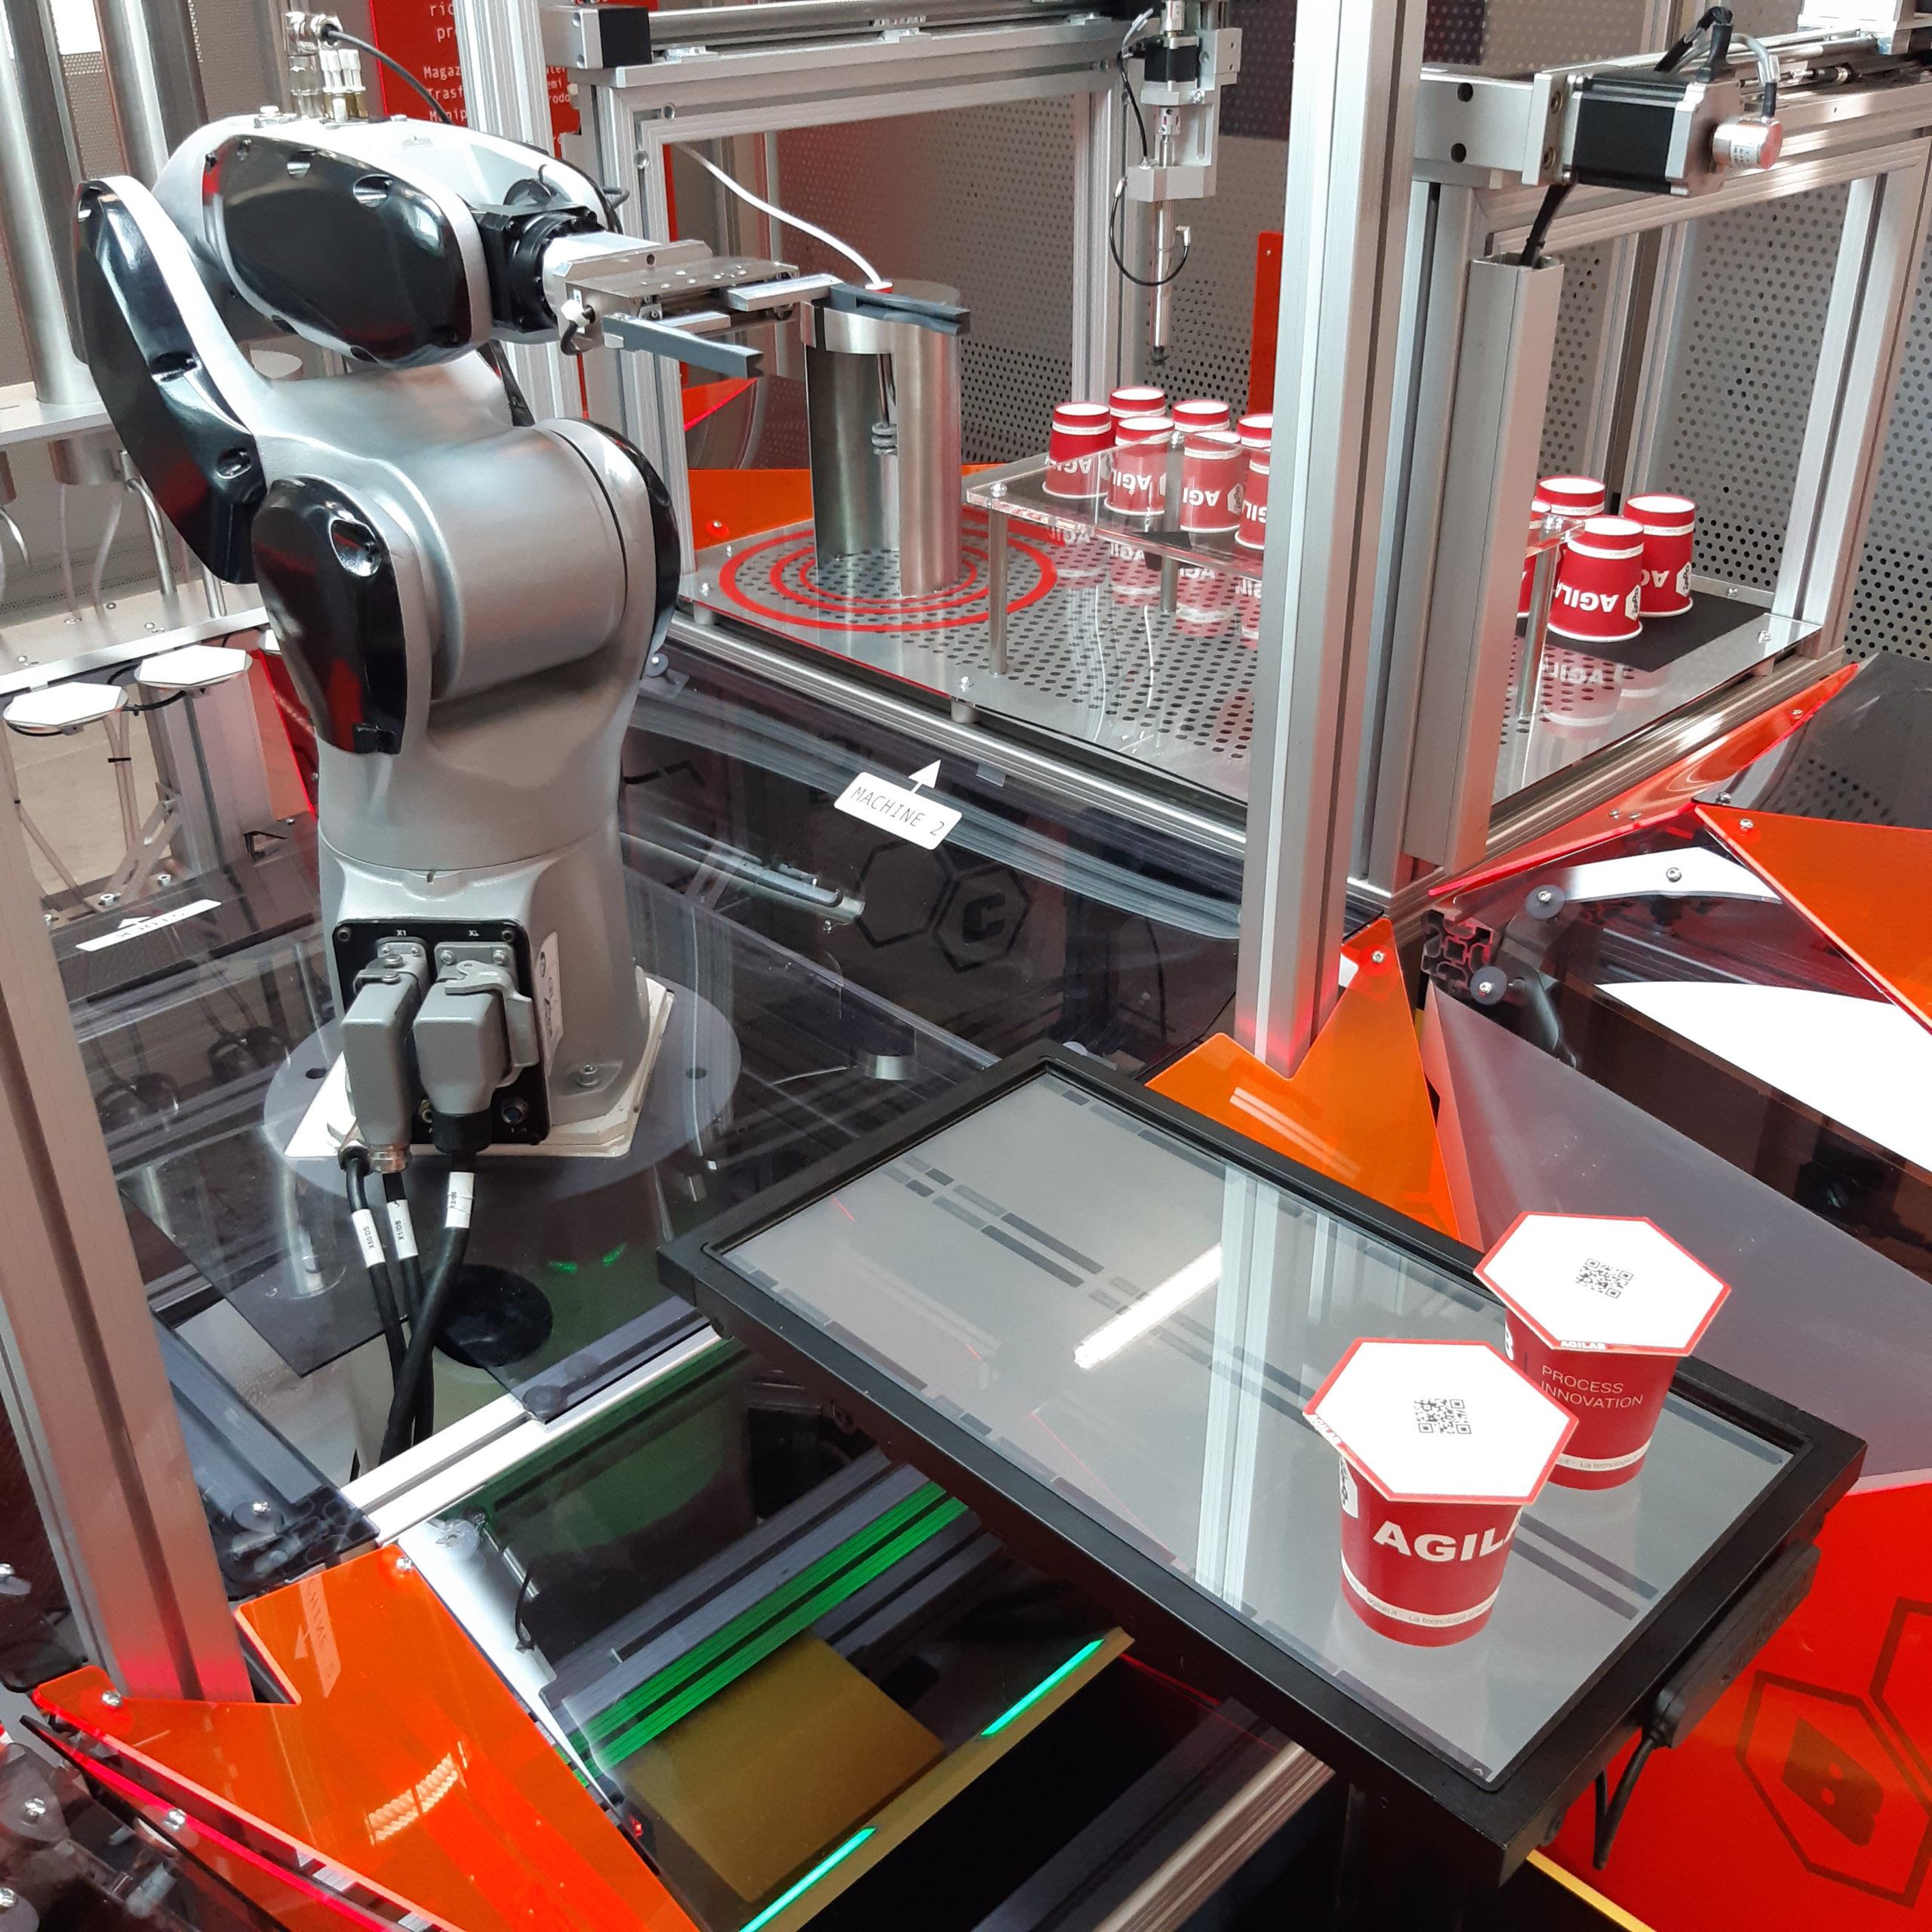 CAM-Robot - Antropomorfo Agilab robotica fissa